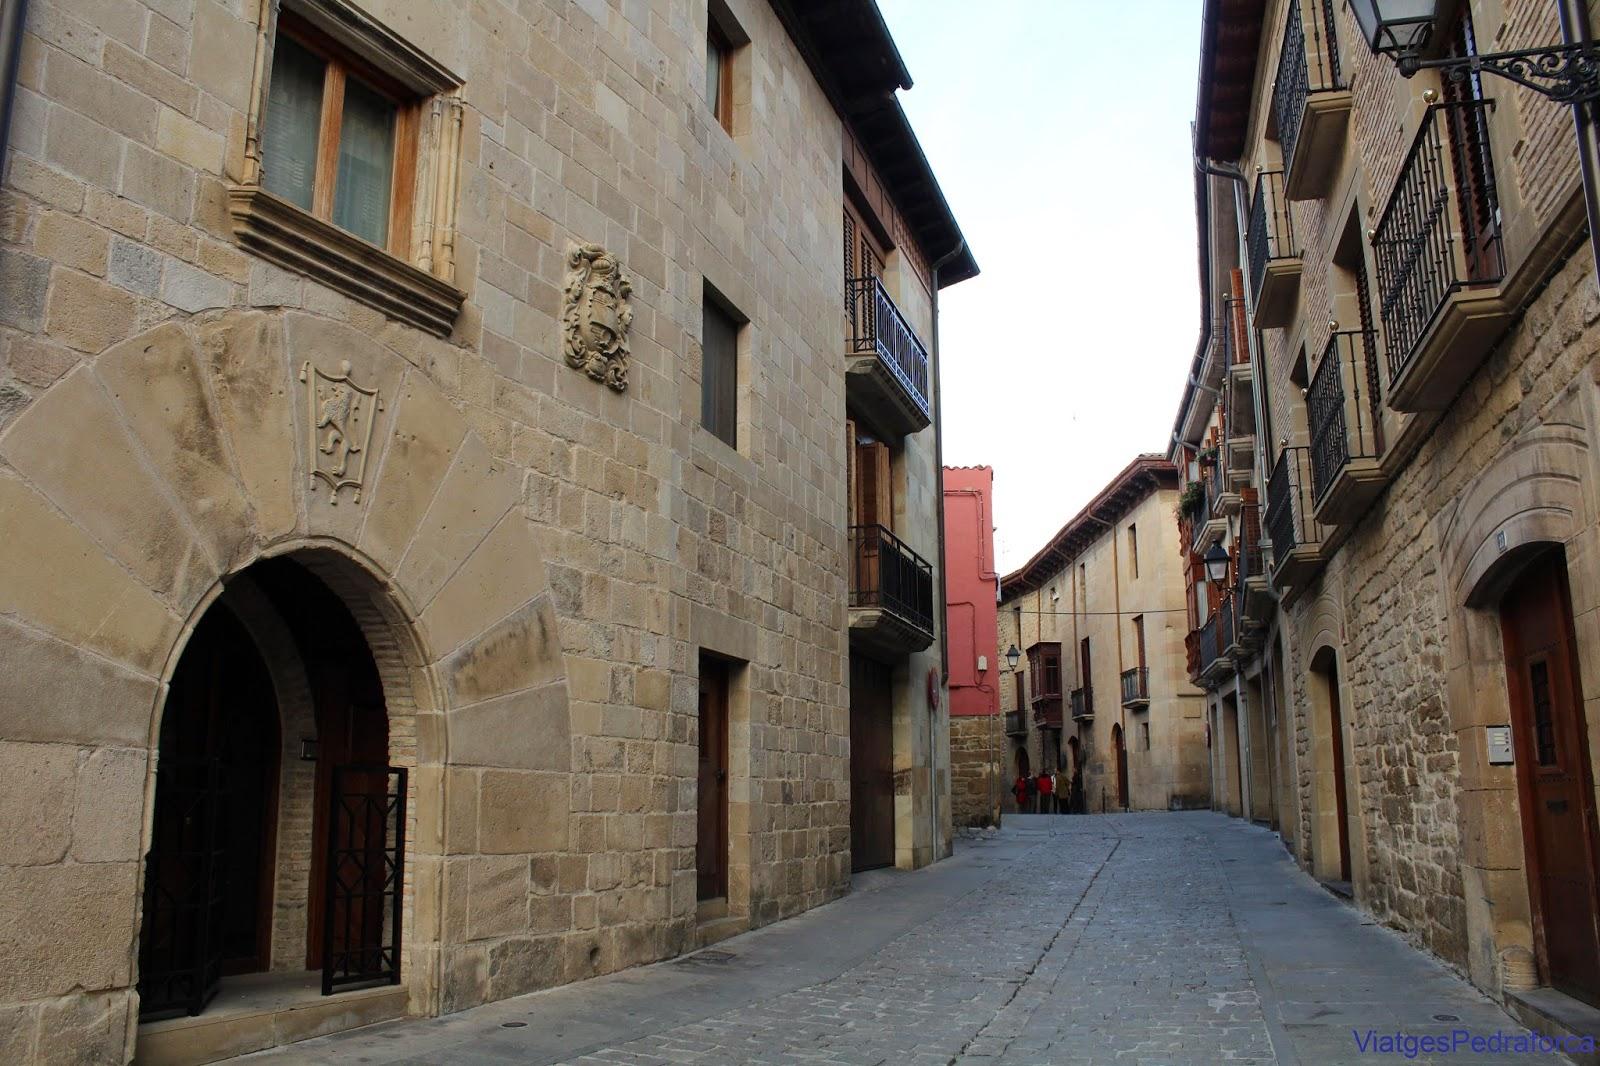 Nucleo antiguo de Tafalla Palacio de Tafalla